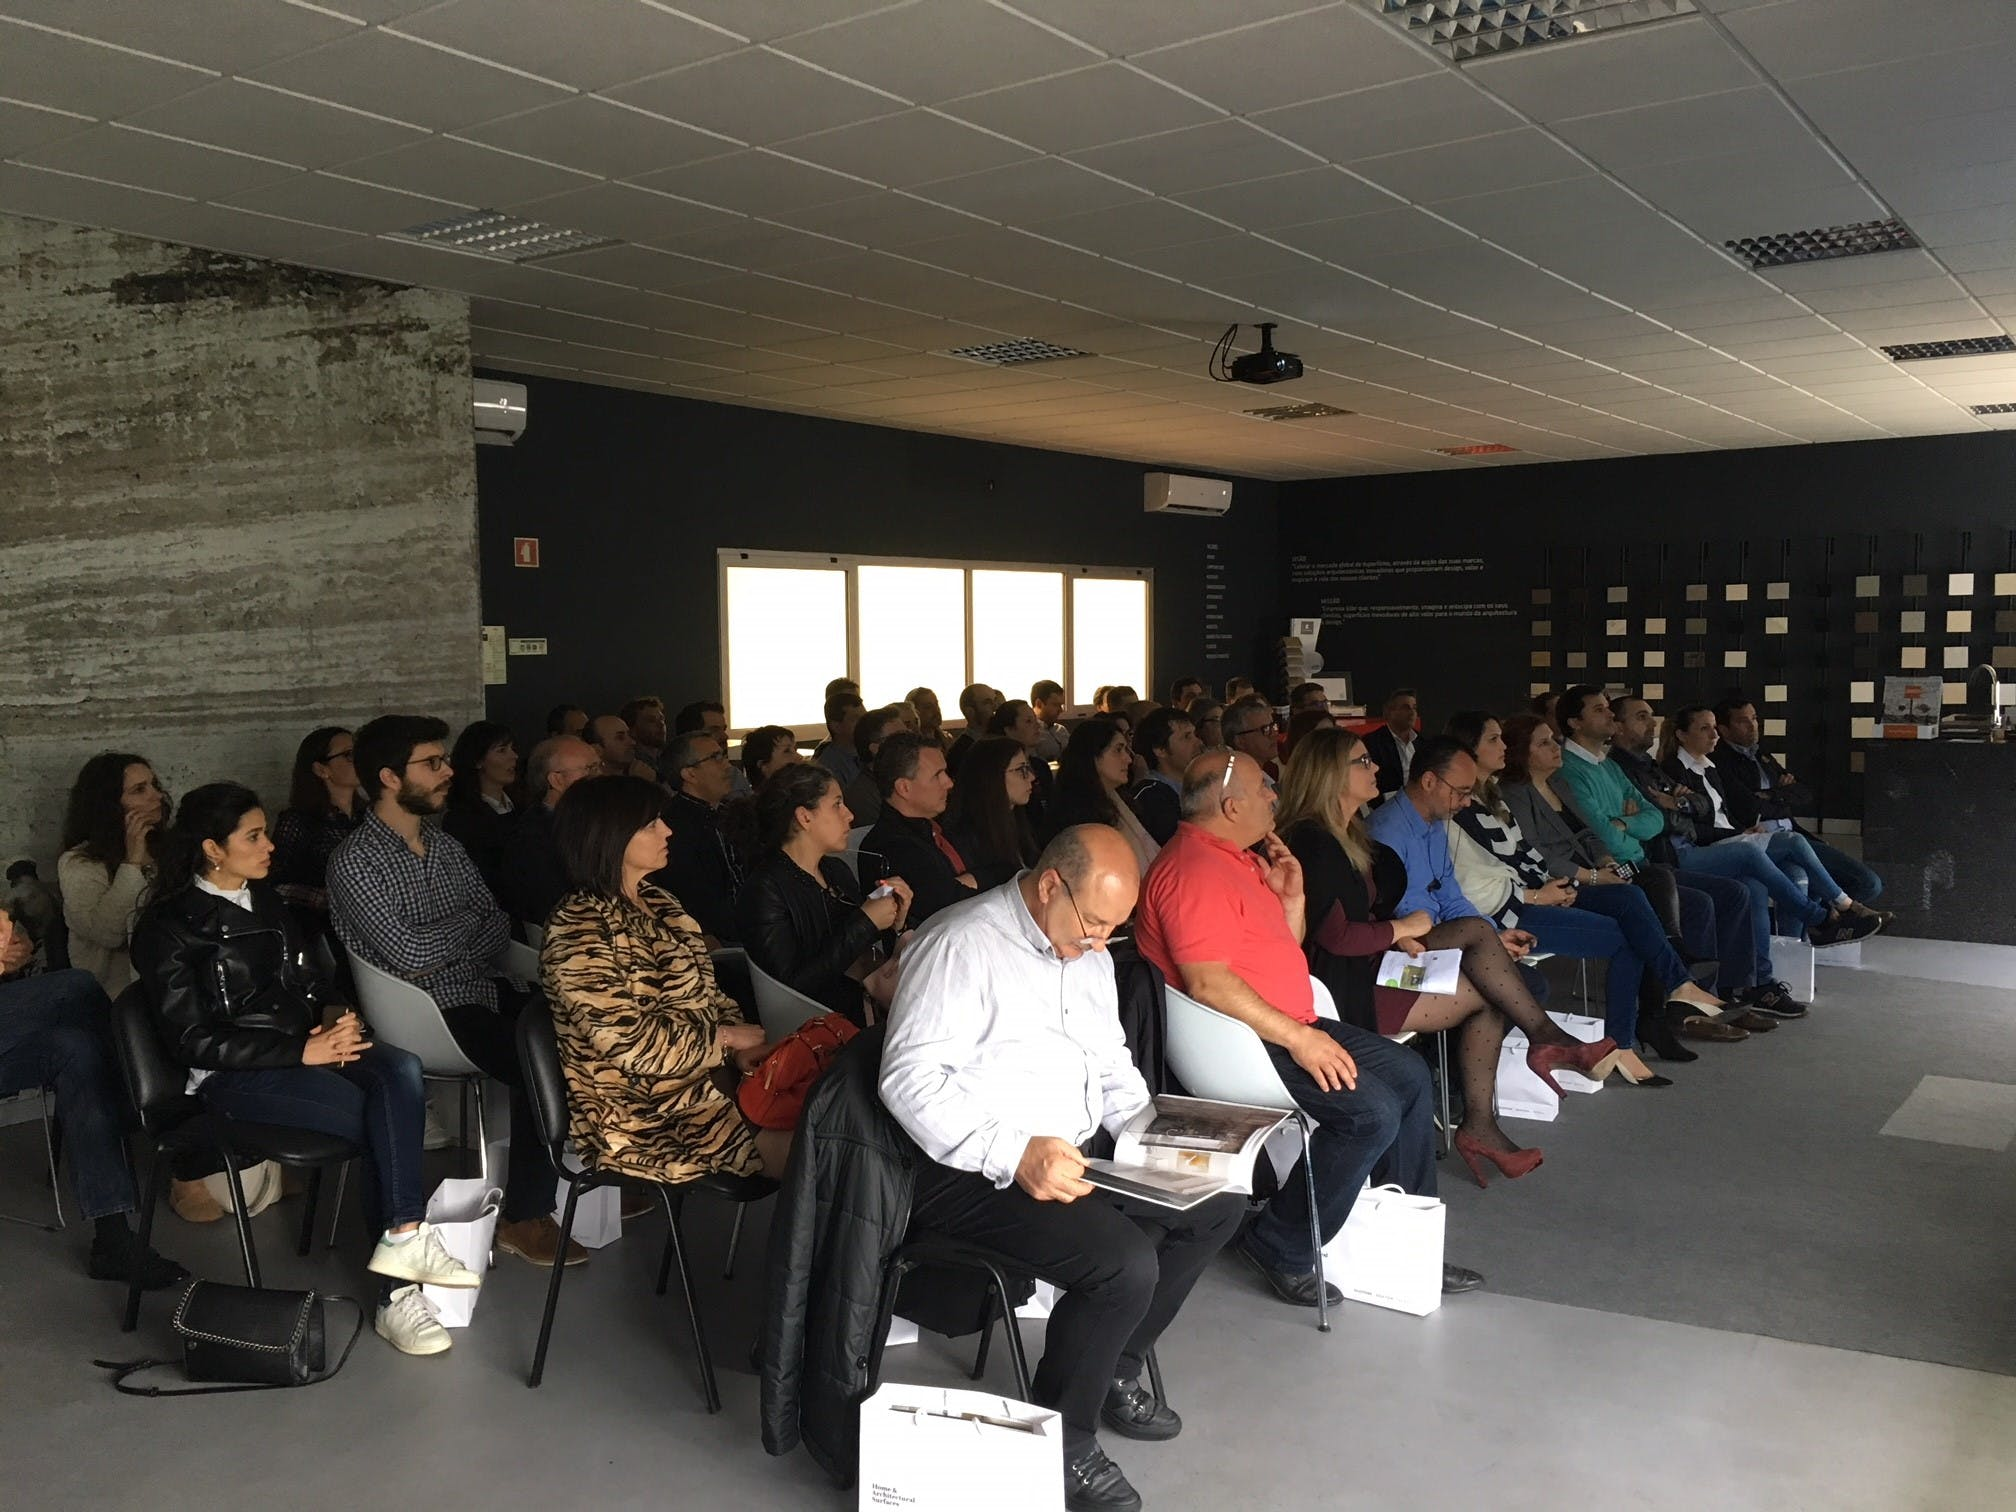 Image of Aula Cosentino Oporto Center 1 in Cosentino brings together more than 2,000 k&b professionals - Cosentino